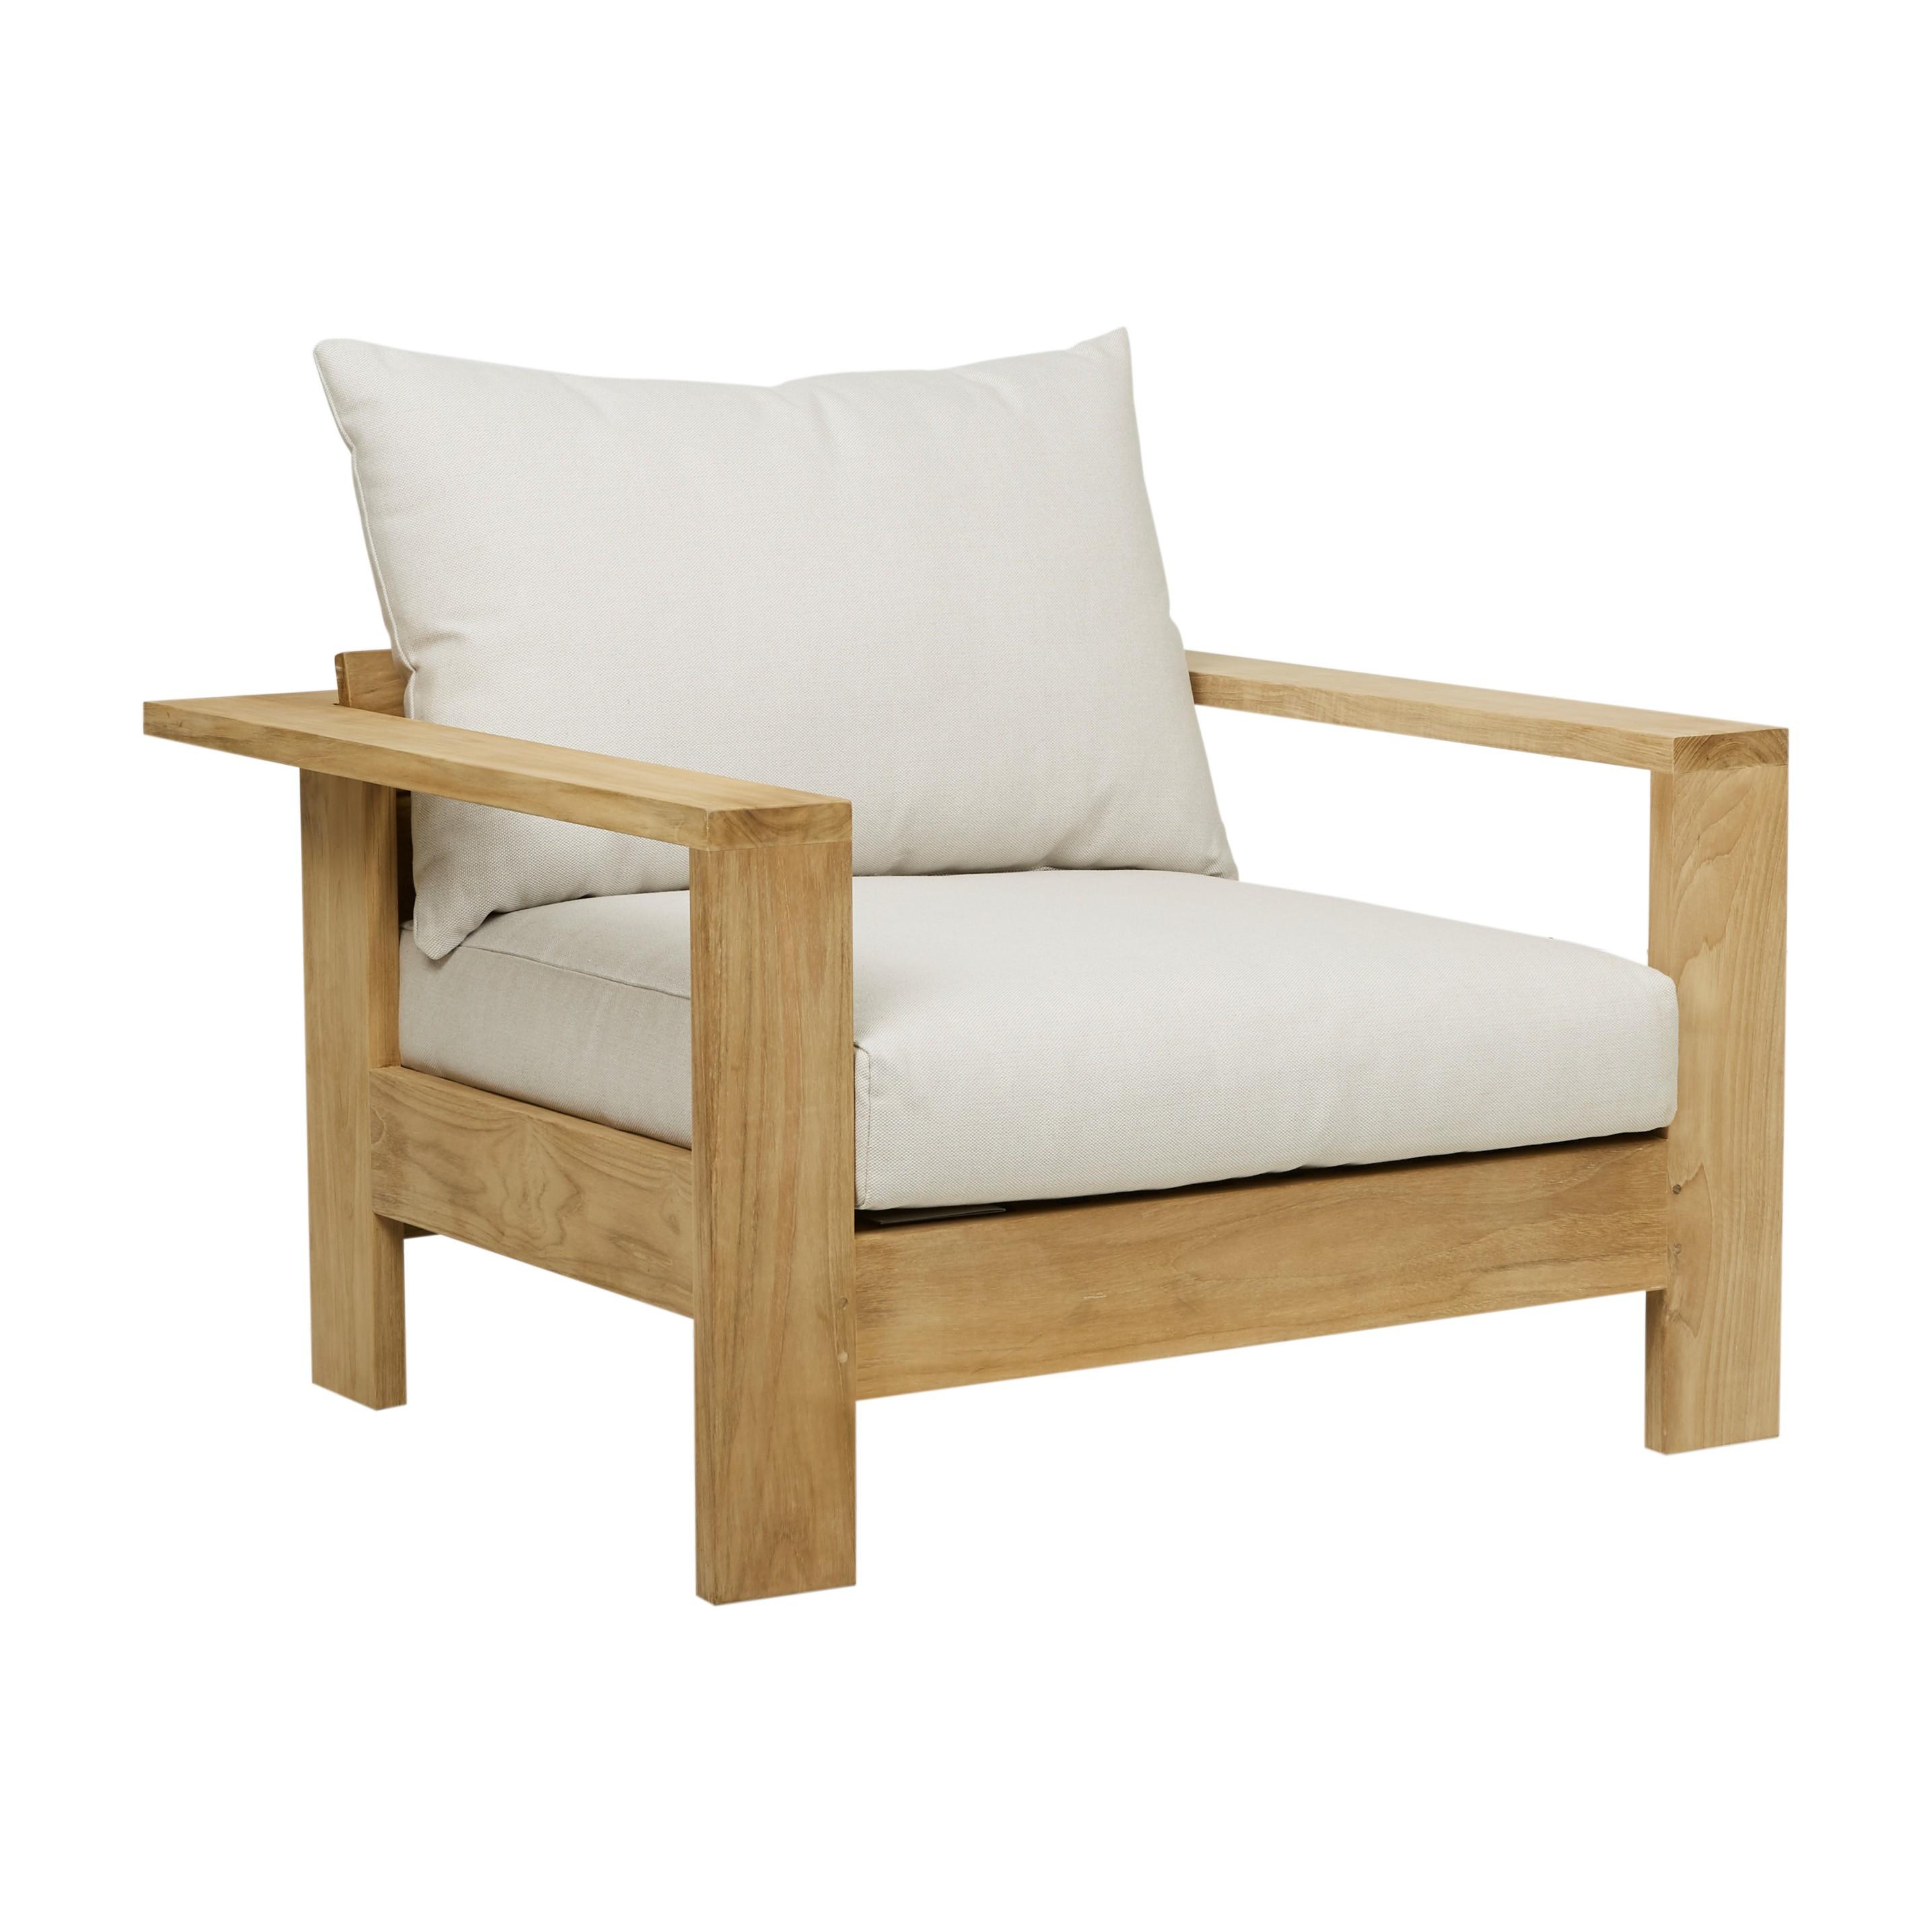 Furniture Hero-Images Sofas hamptons-one-seater-01